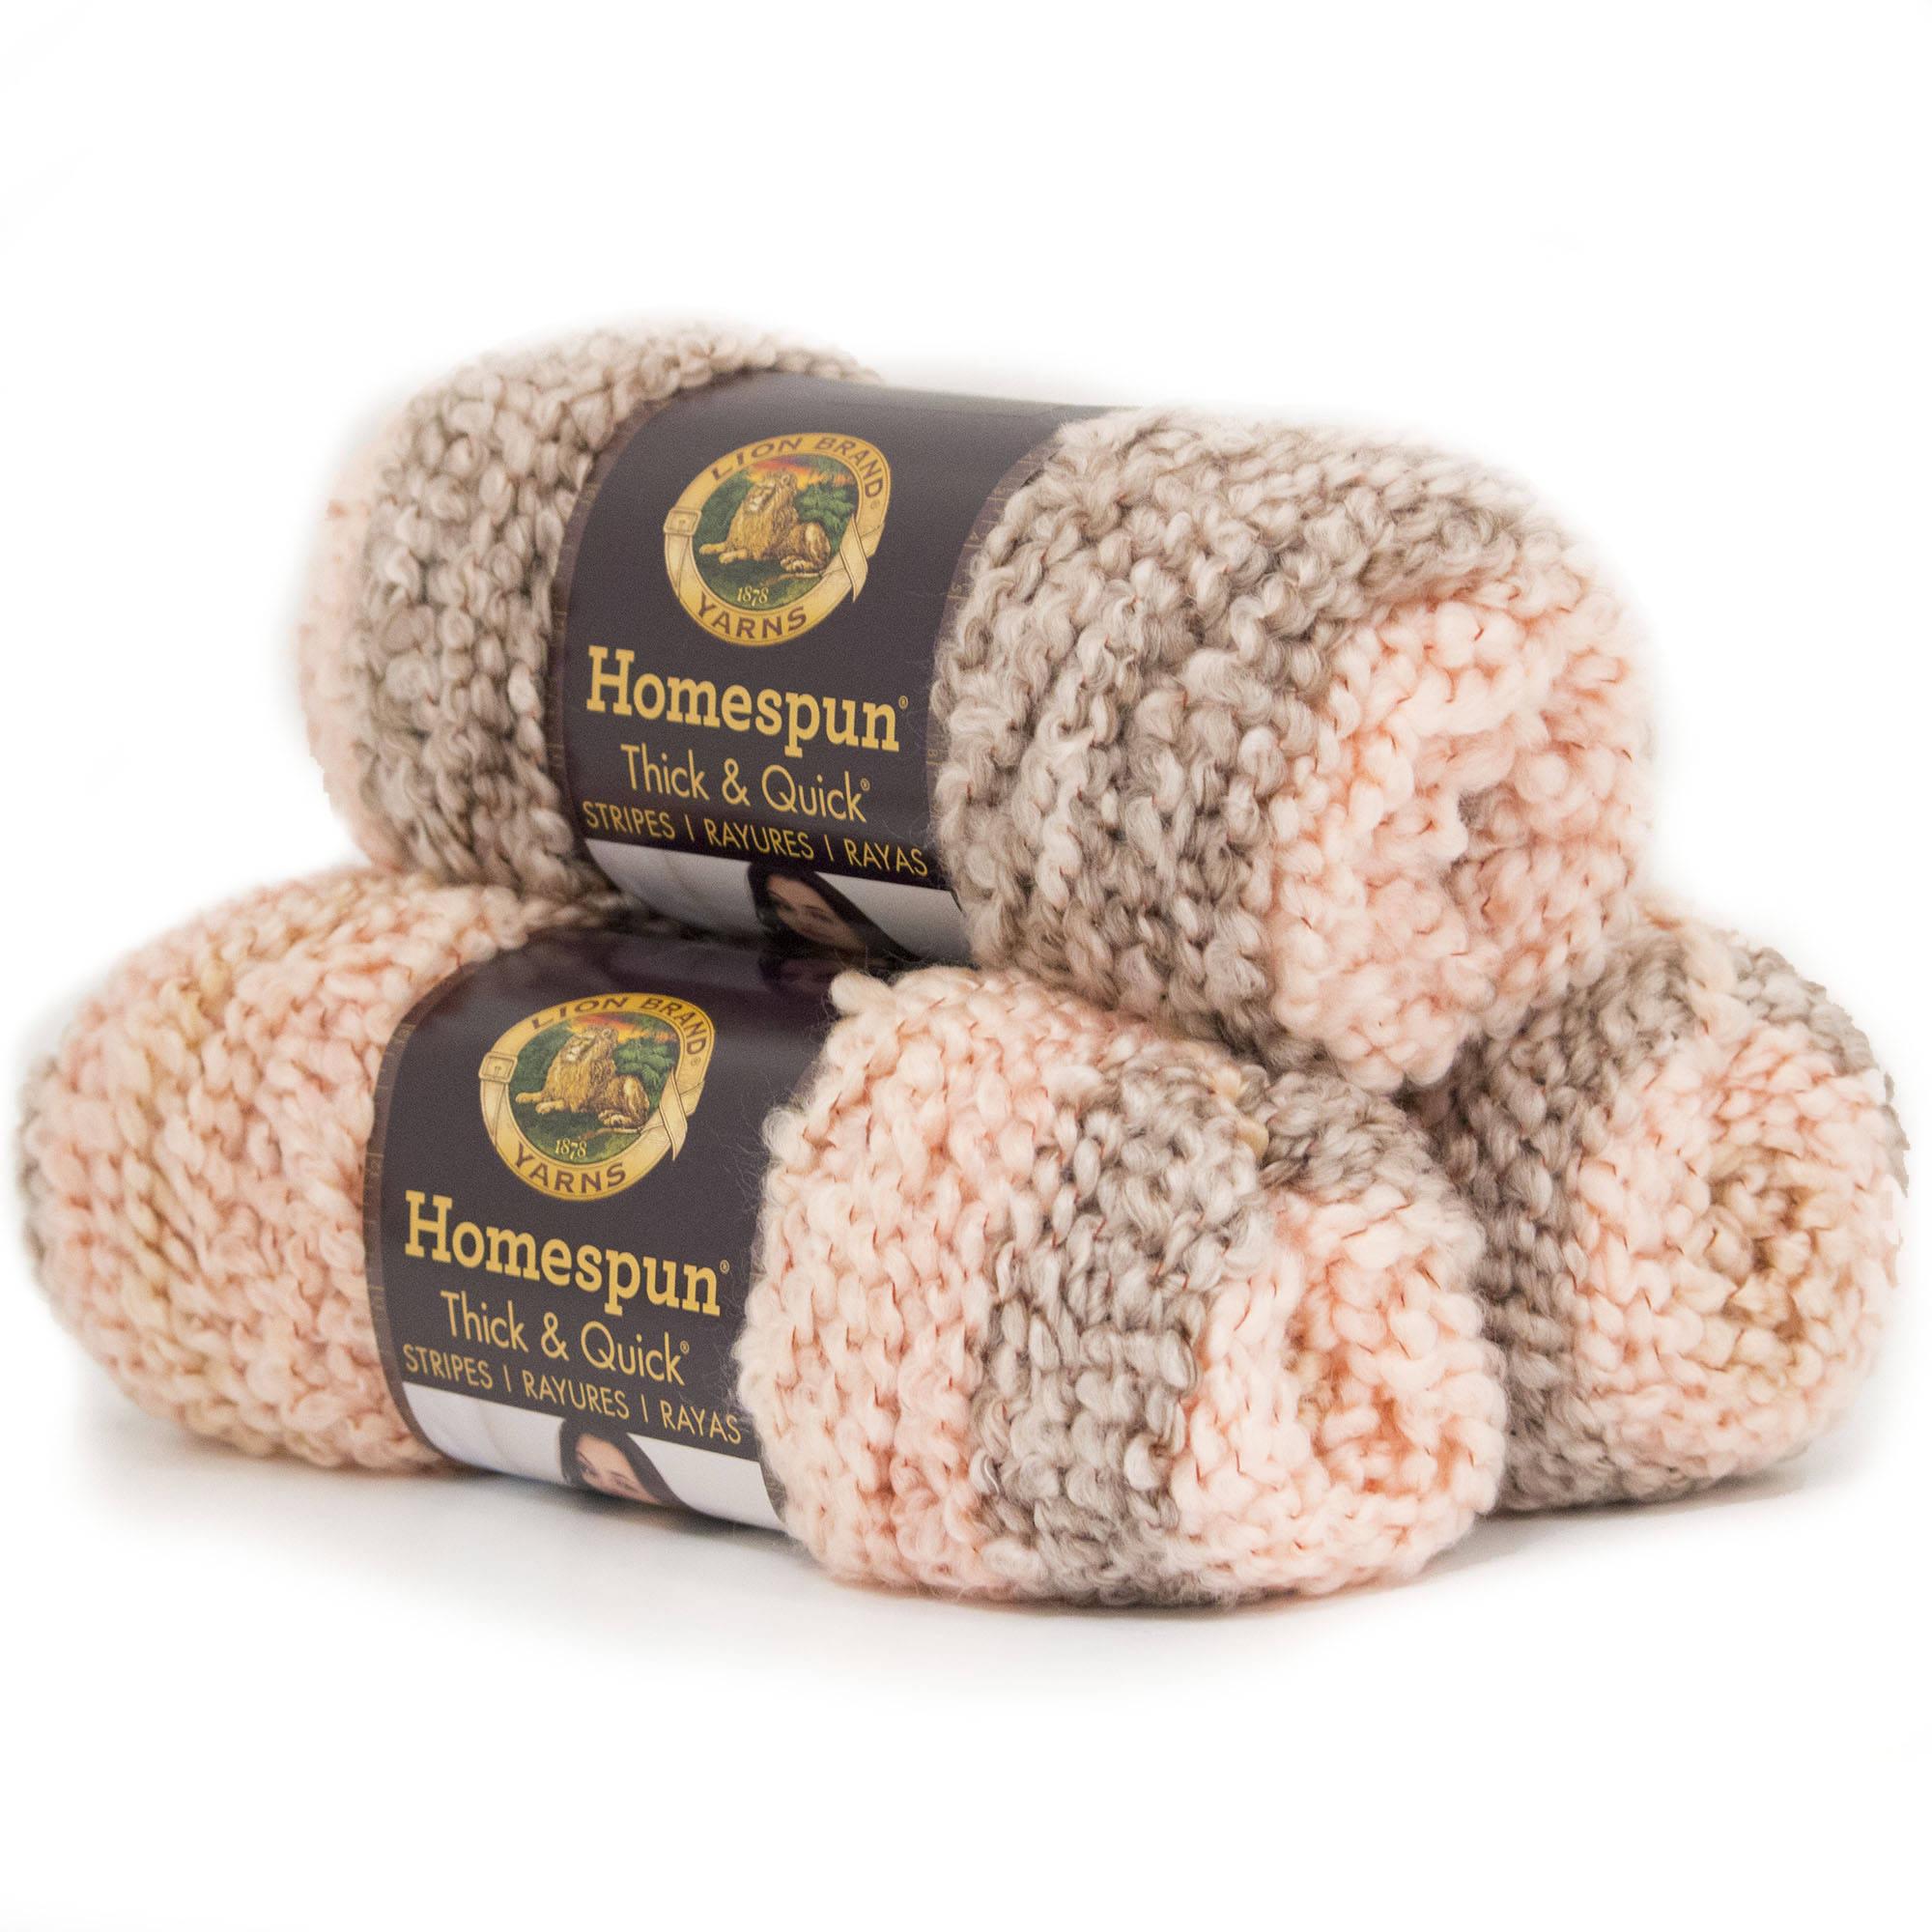 Lion Brand Yarn Homespun Thick and Quick Acrylic Fashion Yarn, 3 Pack